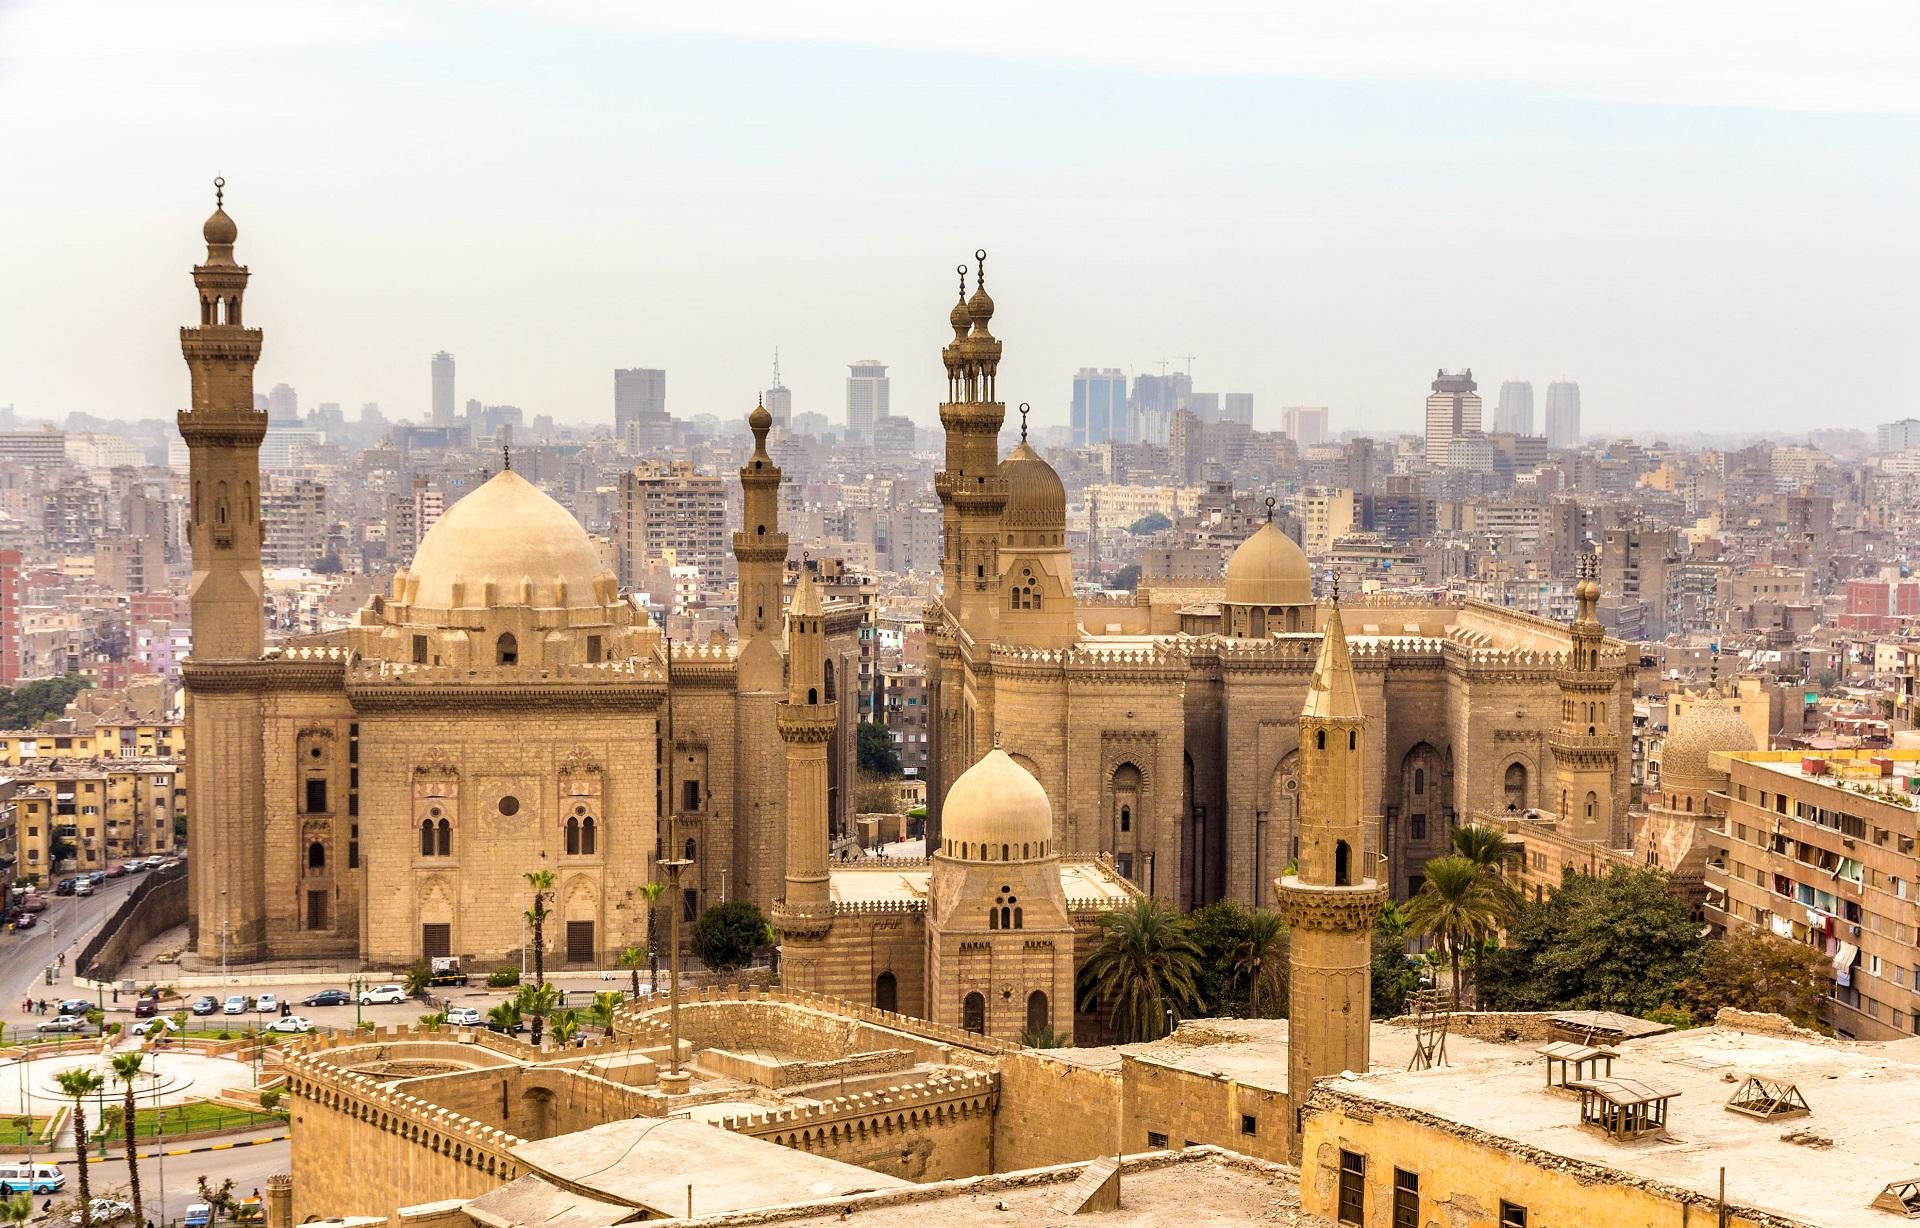 view-mosques-sultan-hassan-al-rifai-cairo-egypt (2)